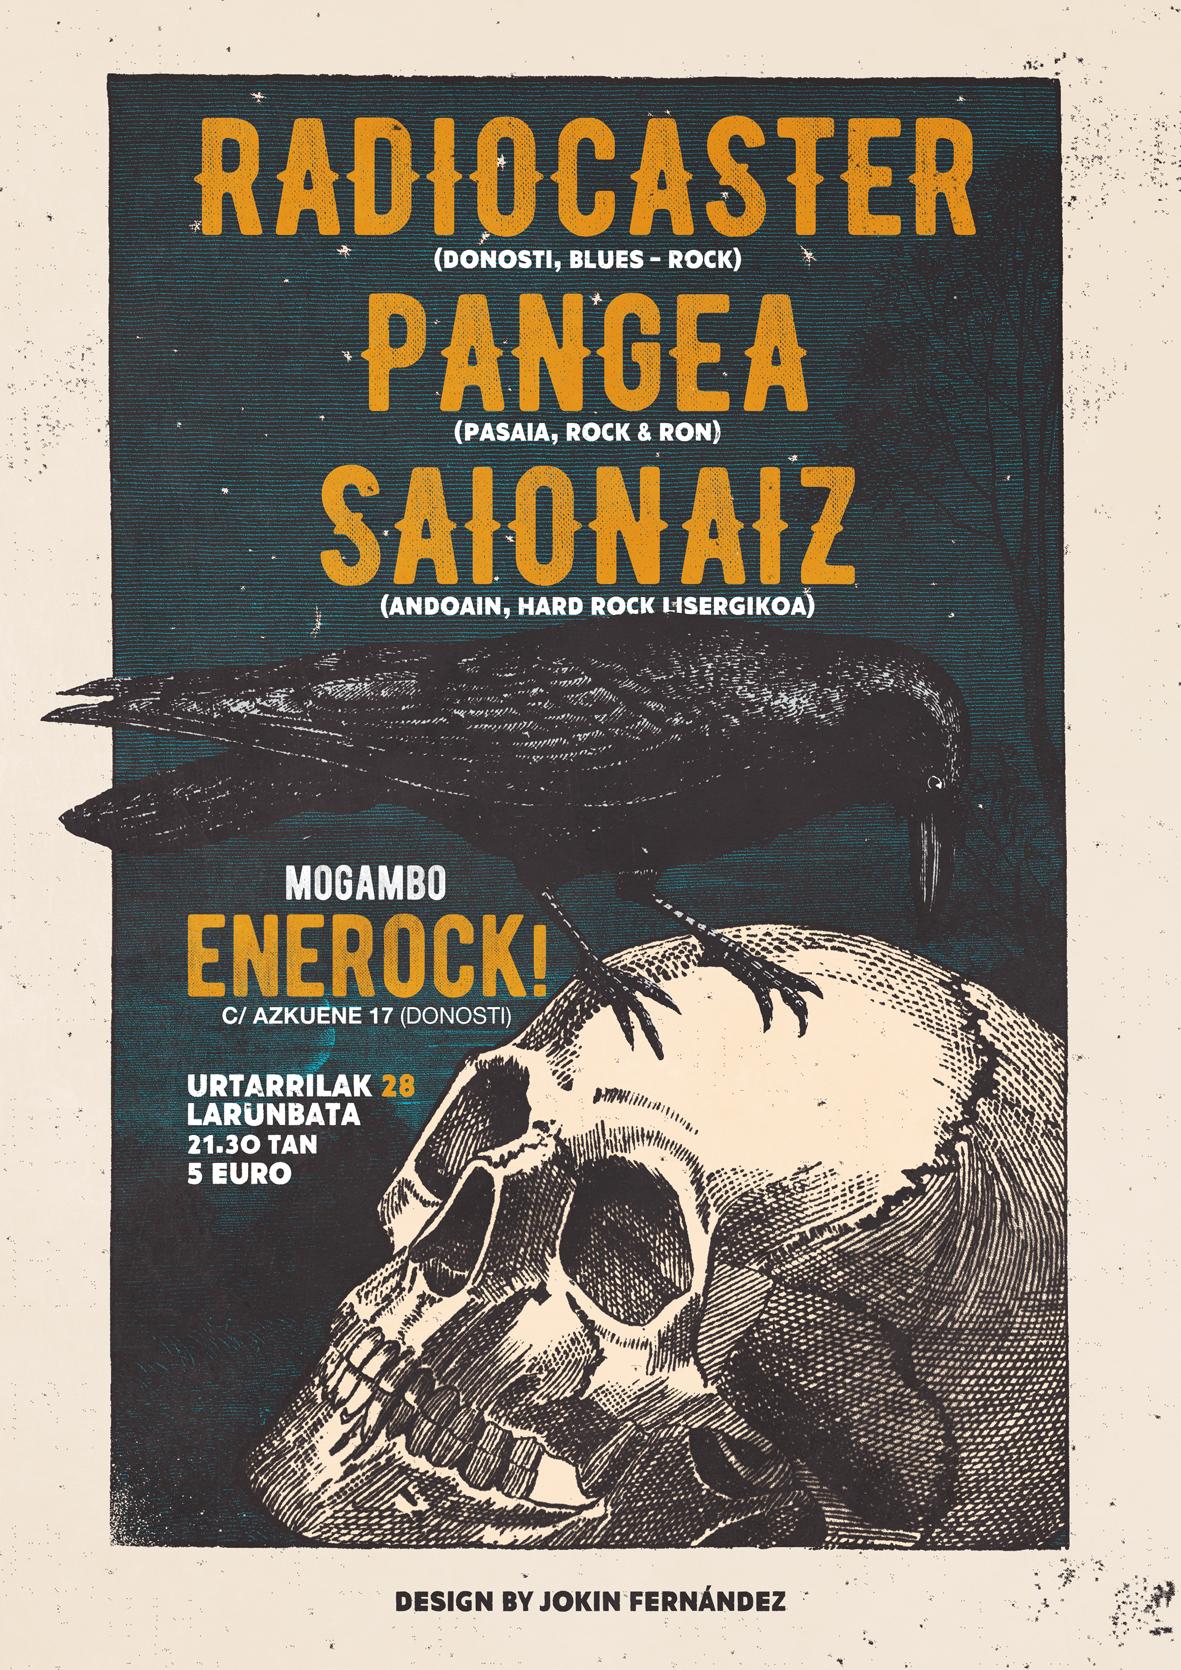 Radiocaster+ Pangea+saionaiz